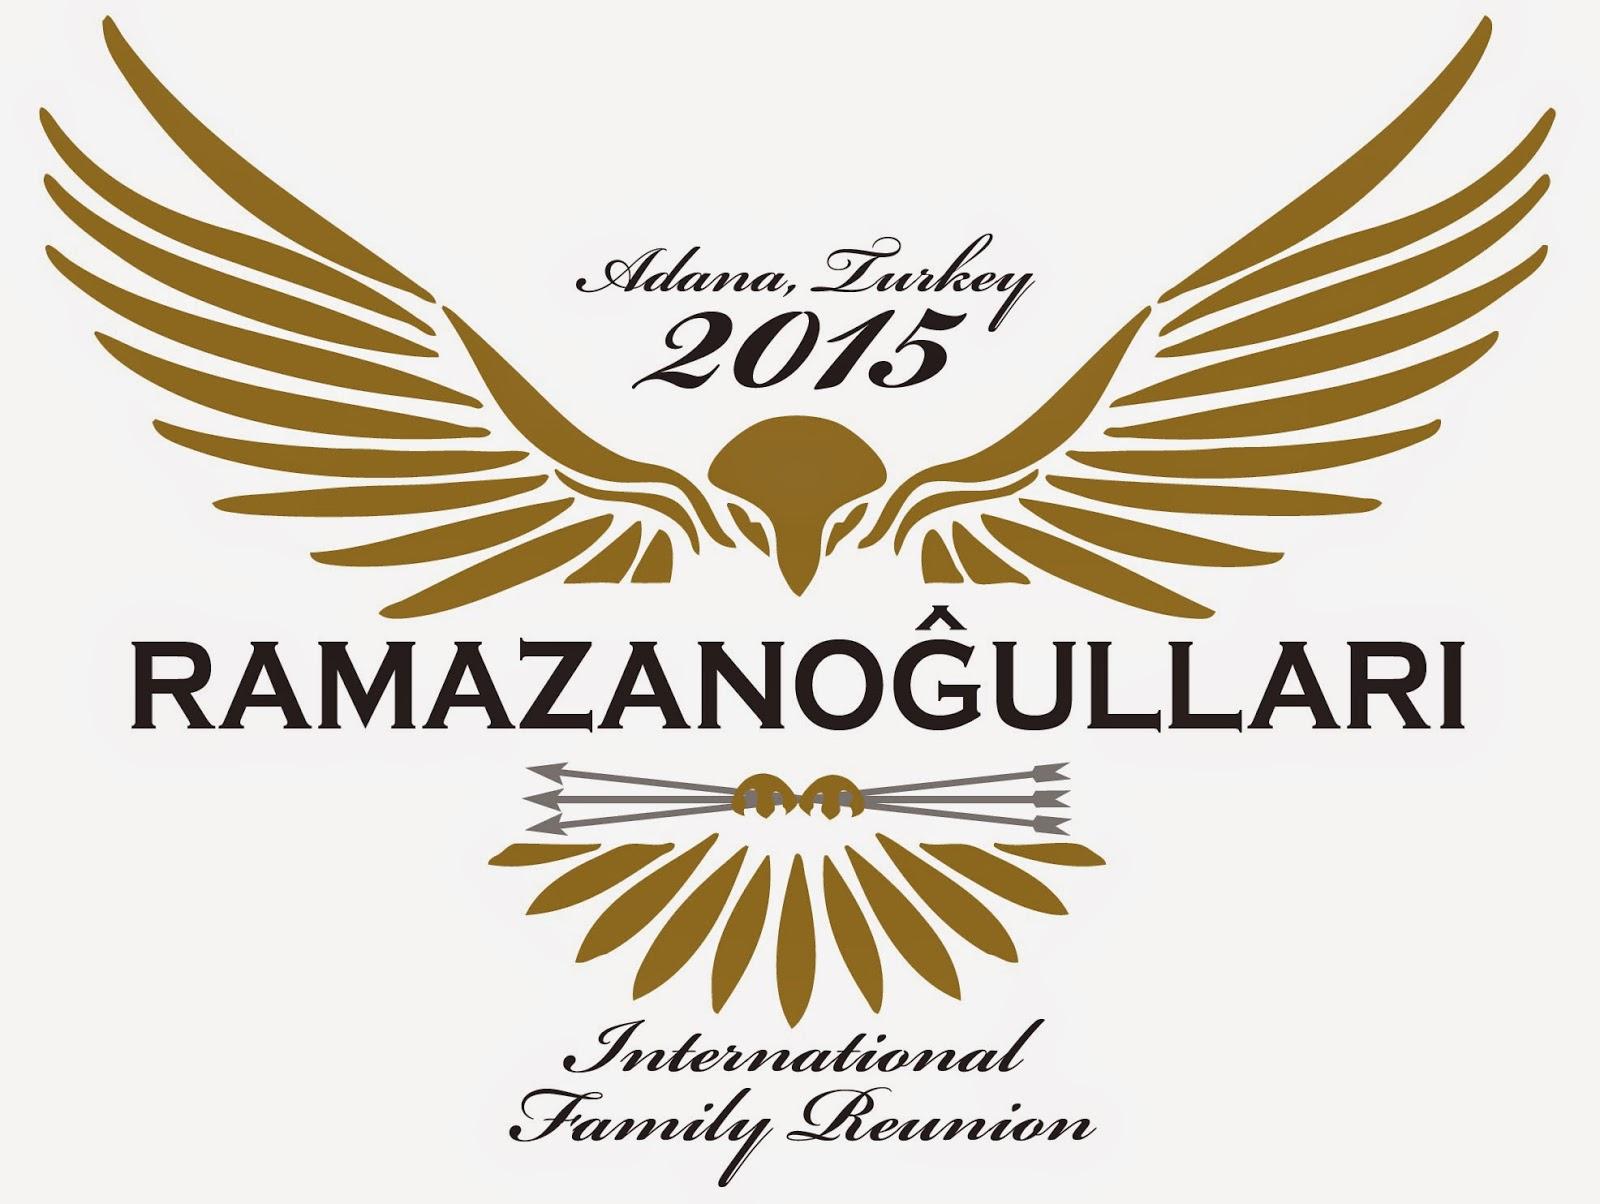 ramazanoglu family reunion adana 2015 ramazanoglu